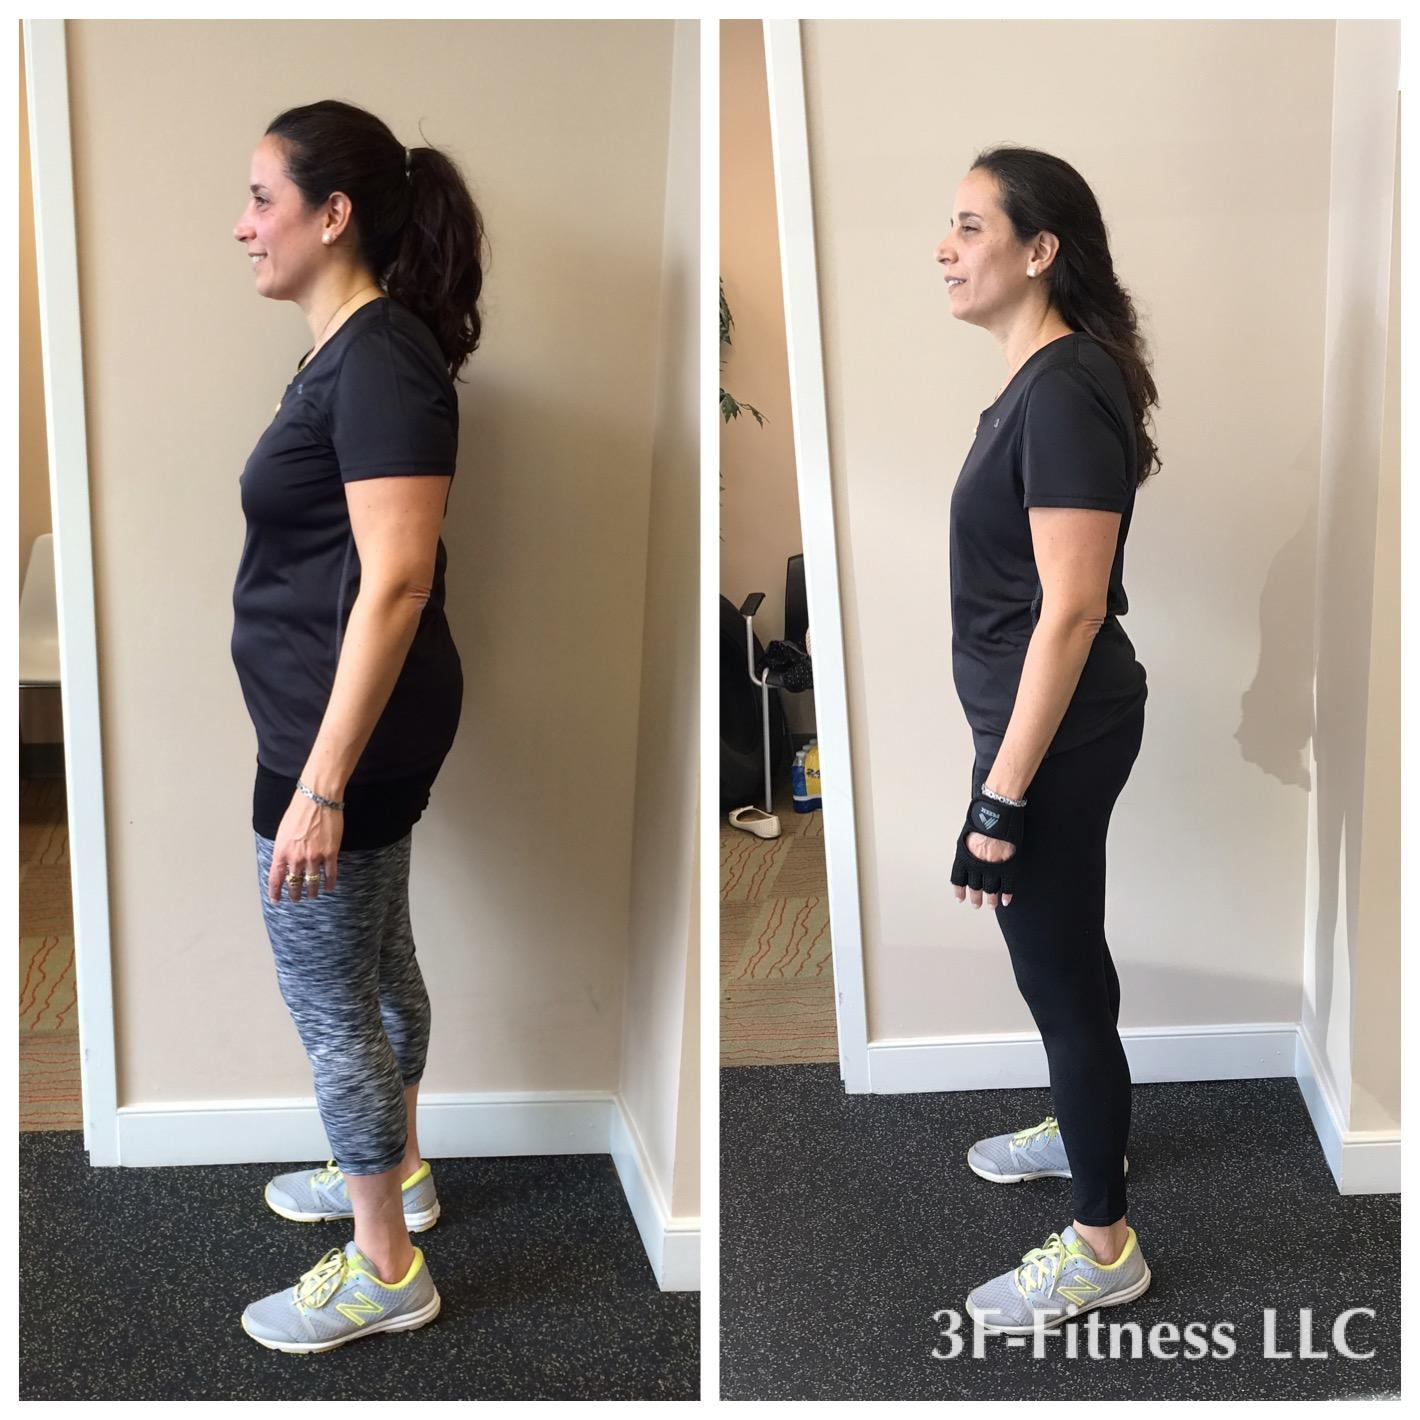 3F-Fitness LLC image 6